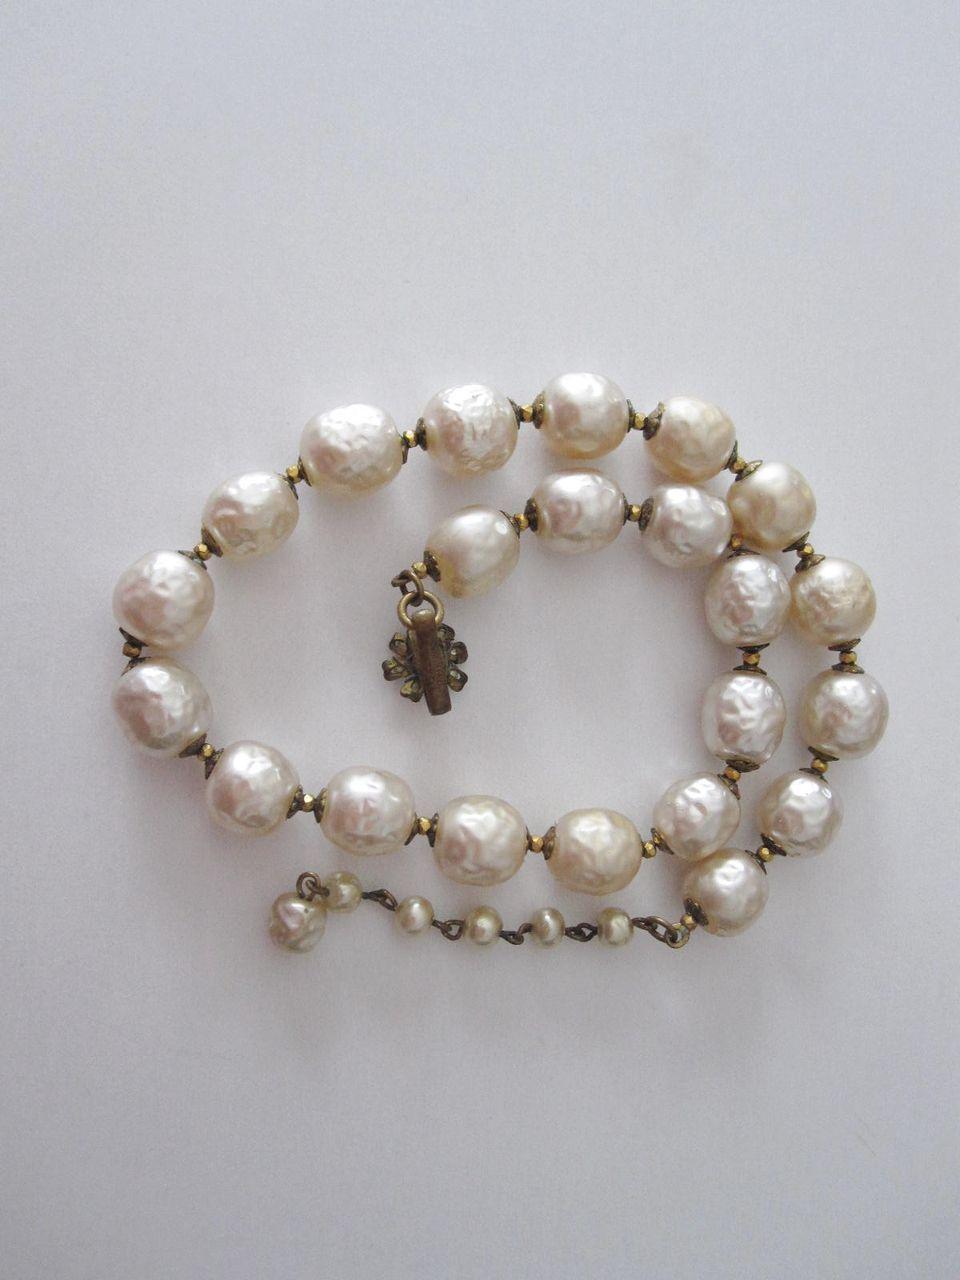 Vintage Jumbo Pearl Miriam Haskell Signed Choker Necklace